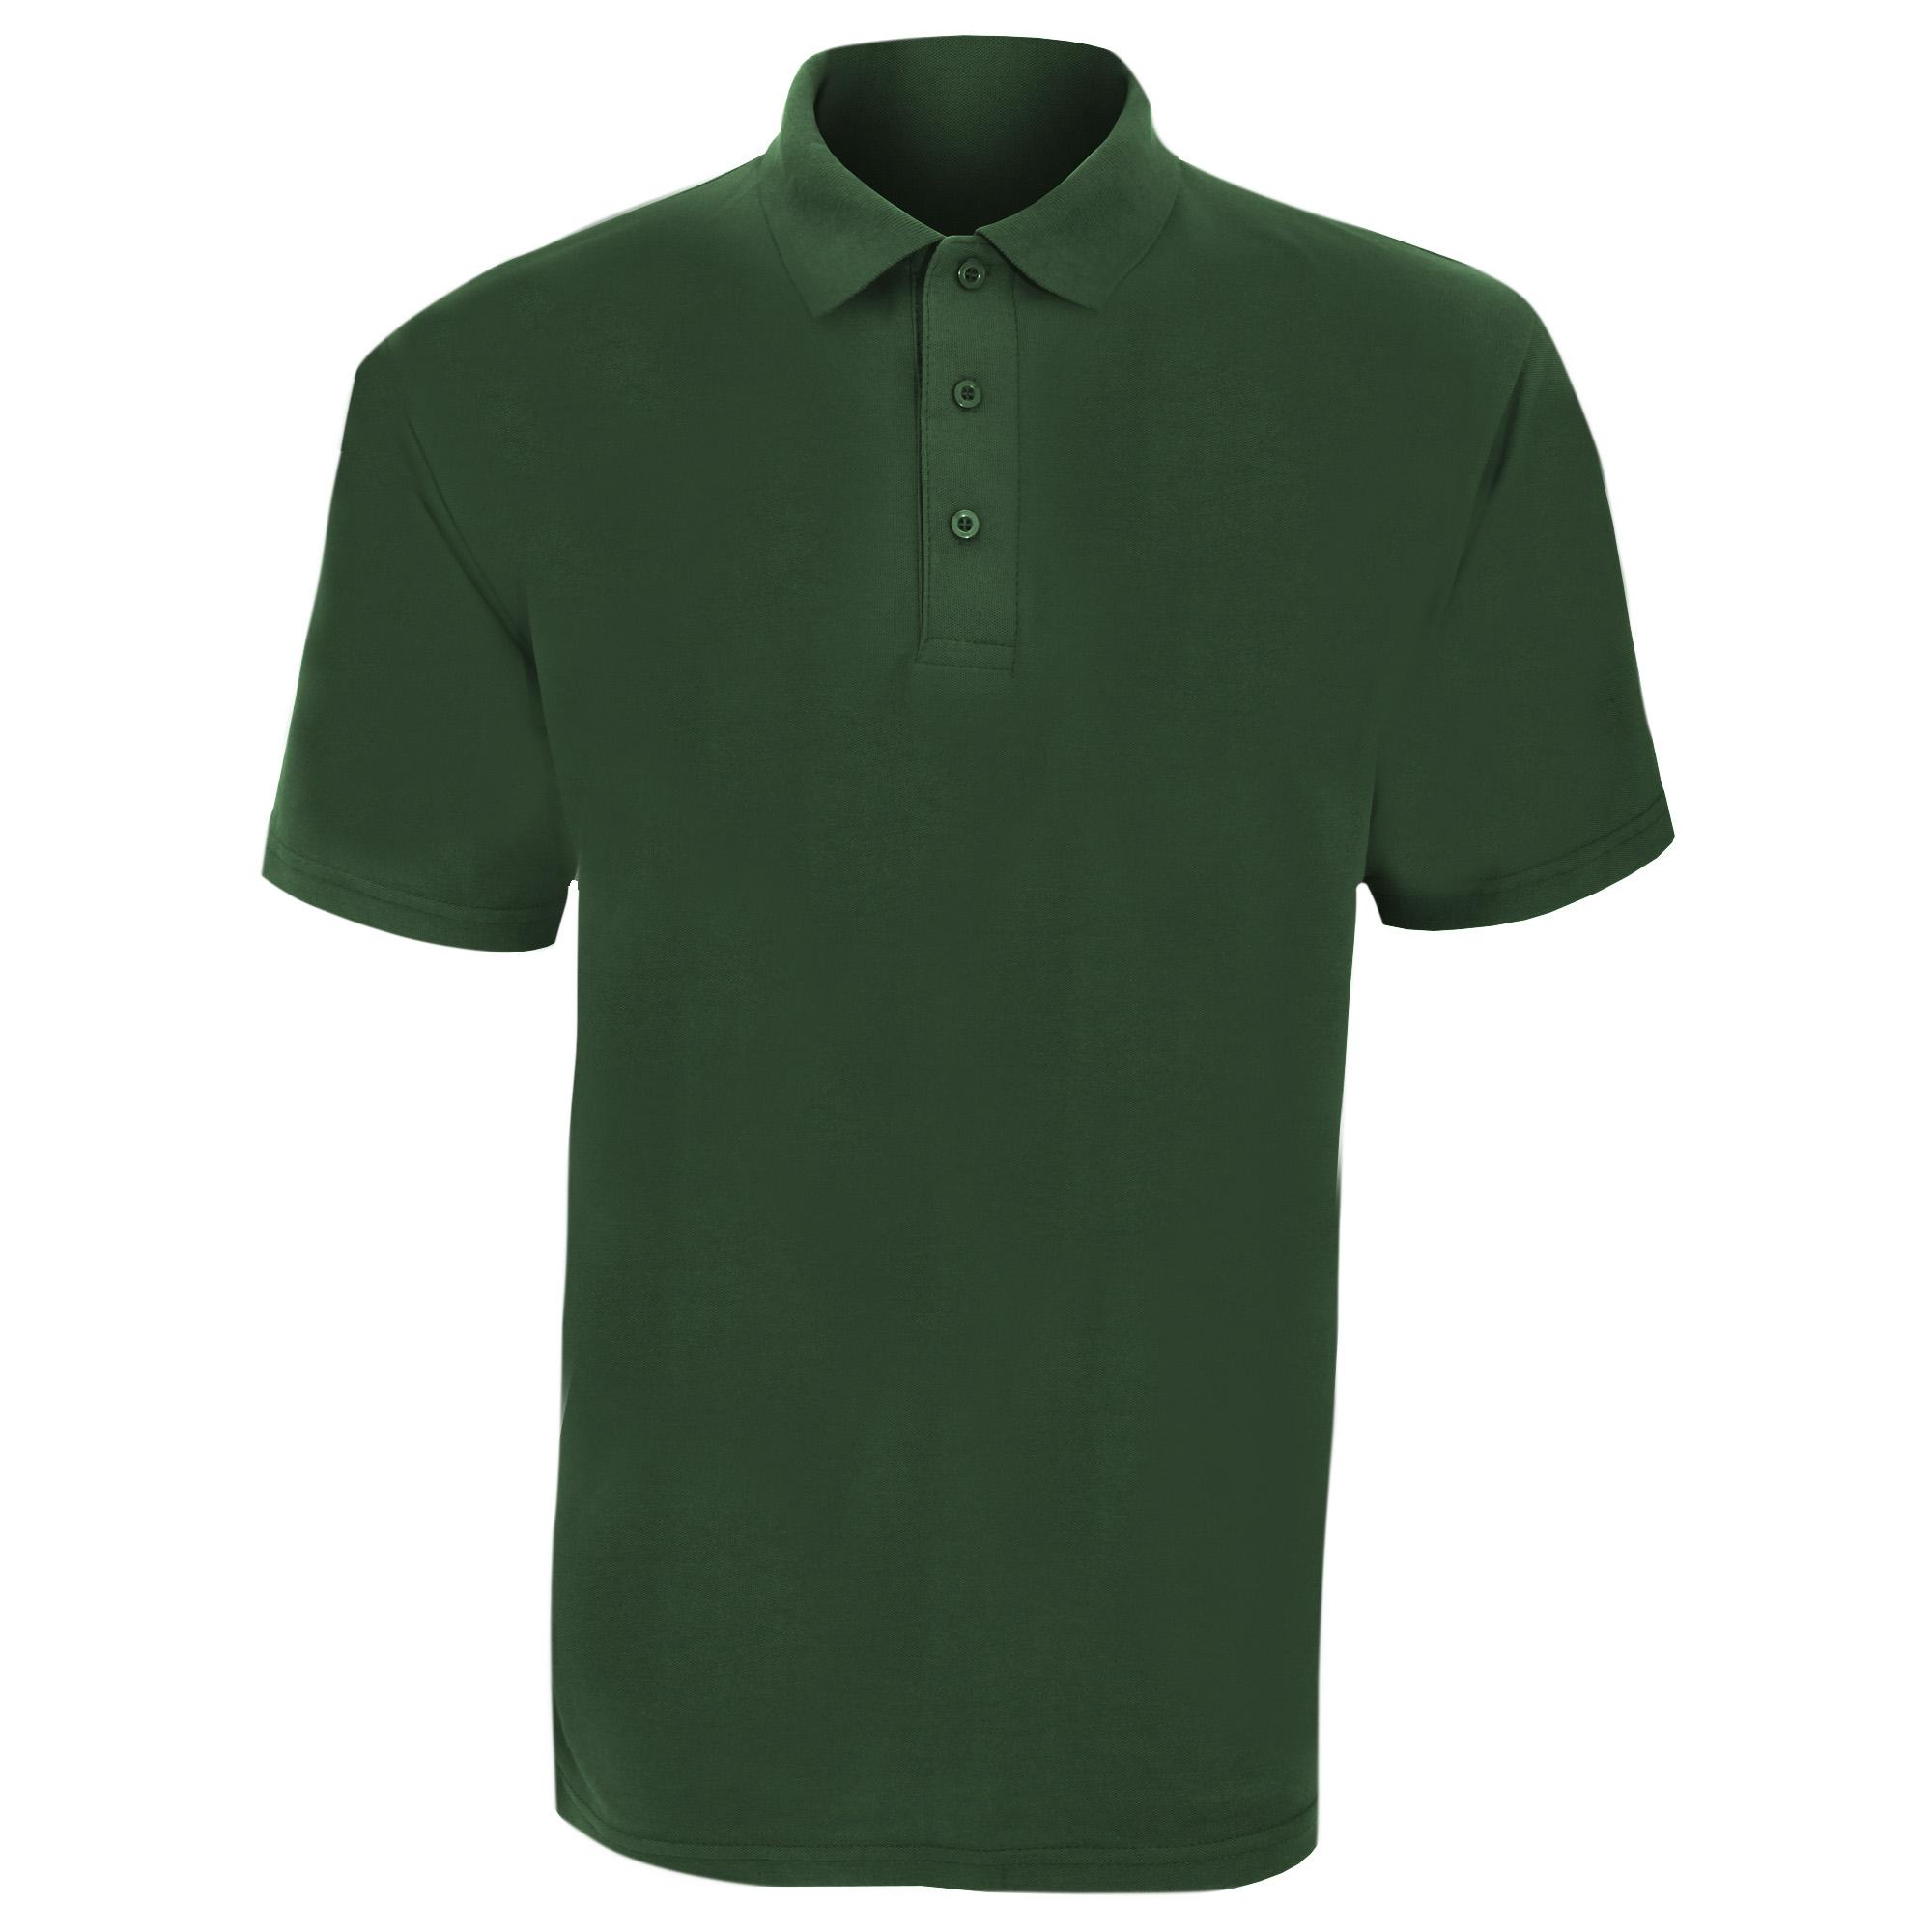 UCC 50/50 Mens Plain Piqué Short Sleeve Polo Shirt (3XL) (Bottle Green)